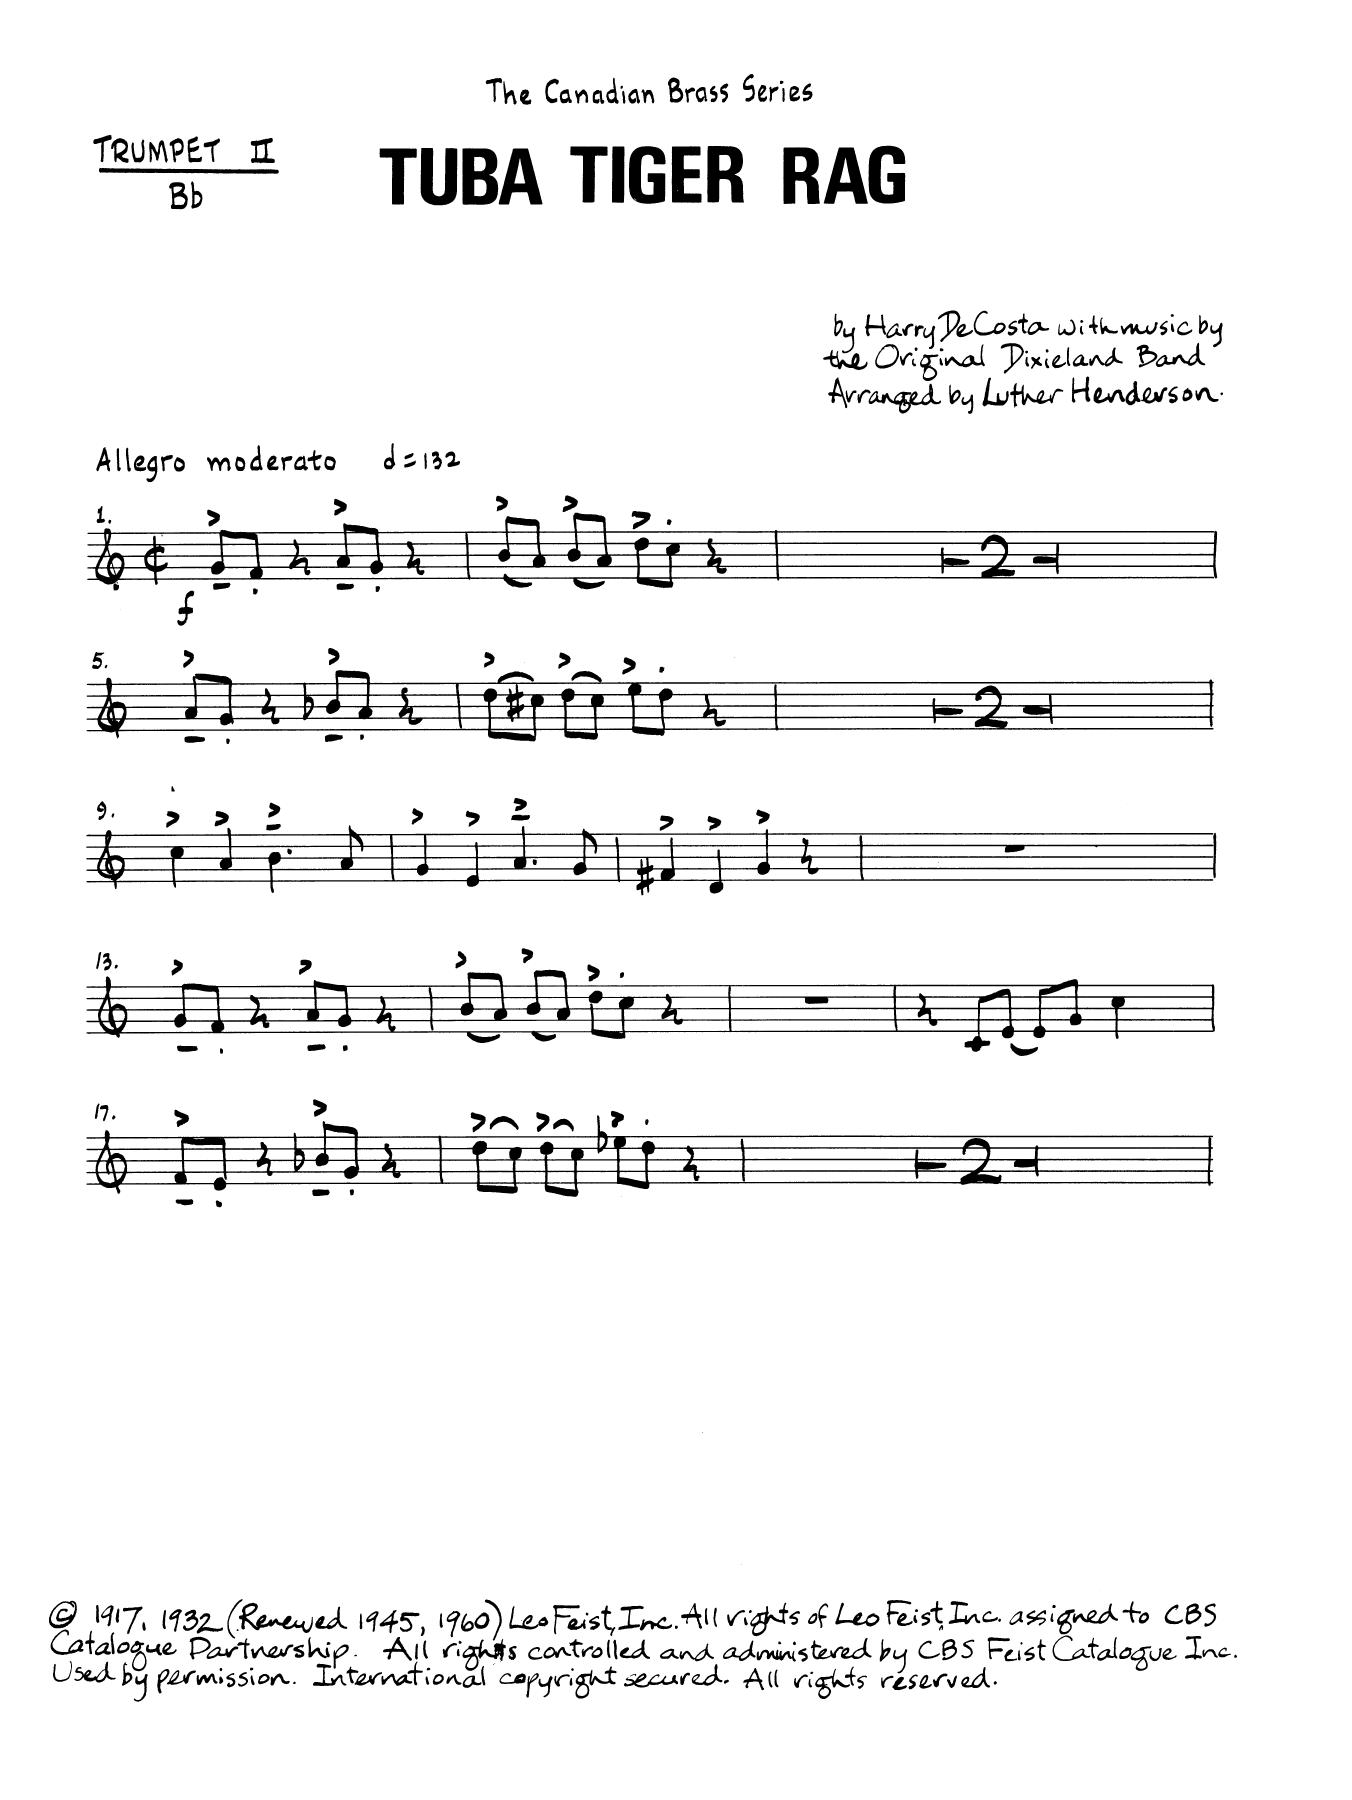 Tuba Tiger Rag - Bb Trumpet 2 (Brass Quintet) Sheet Music